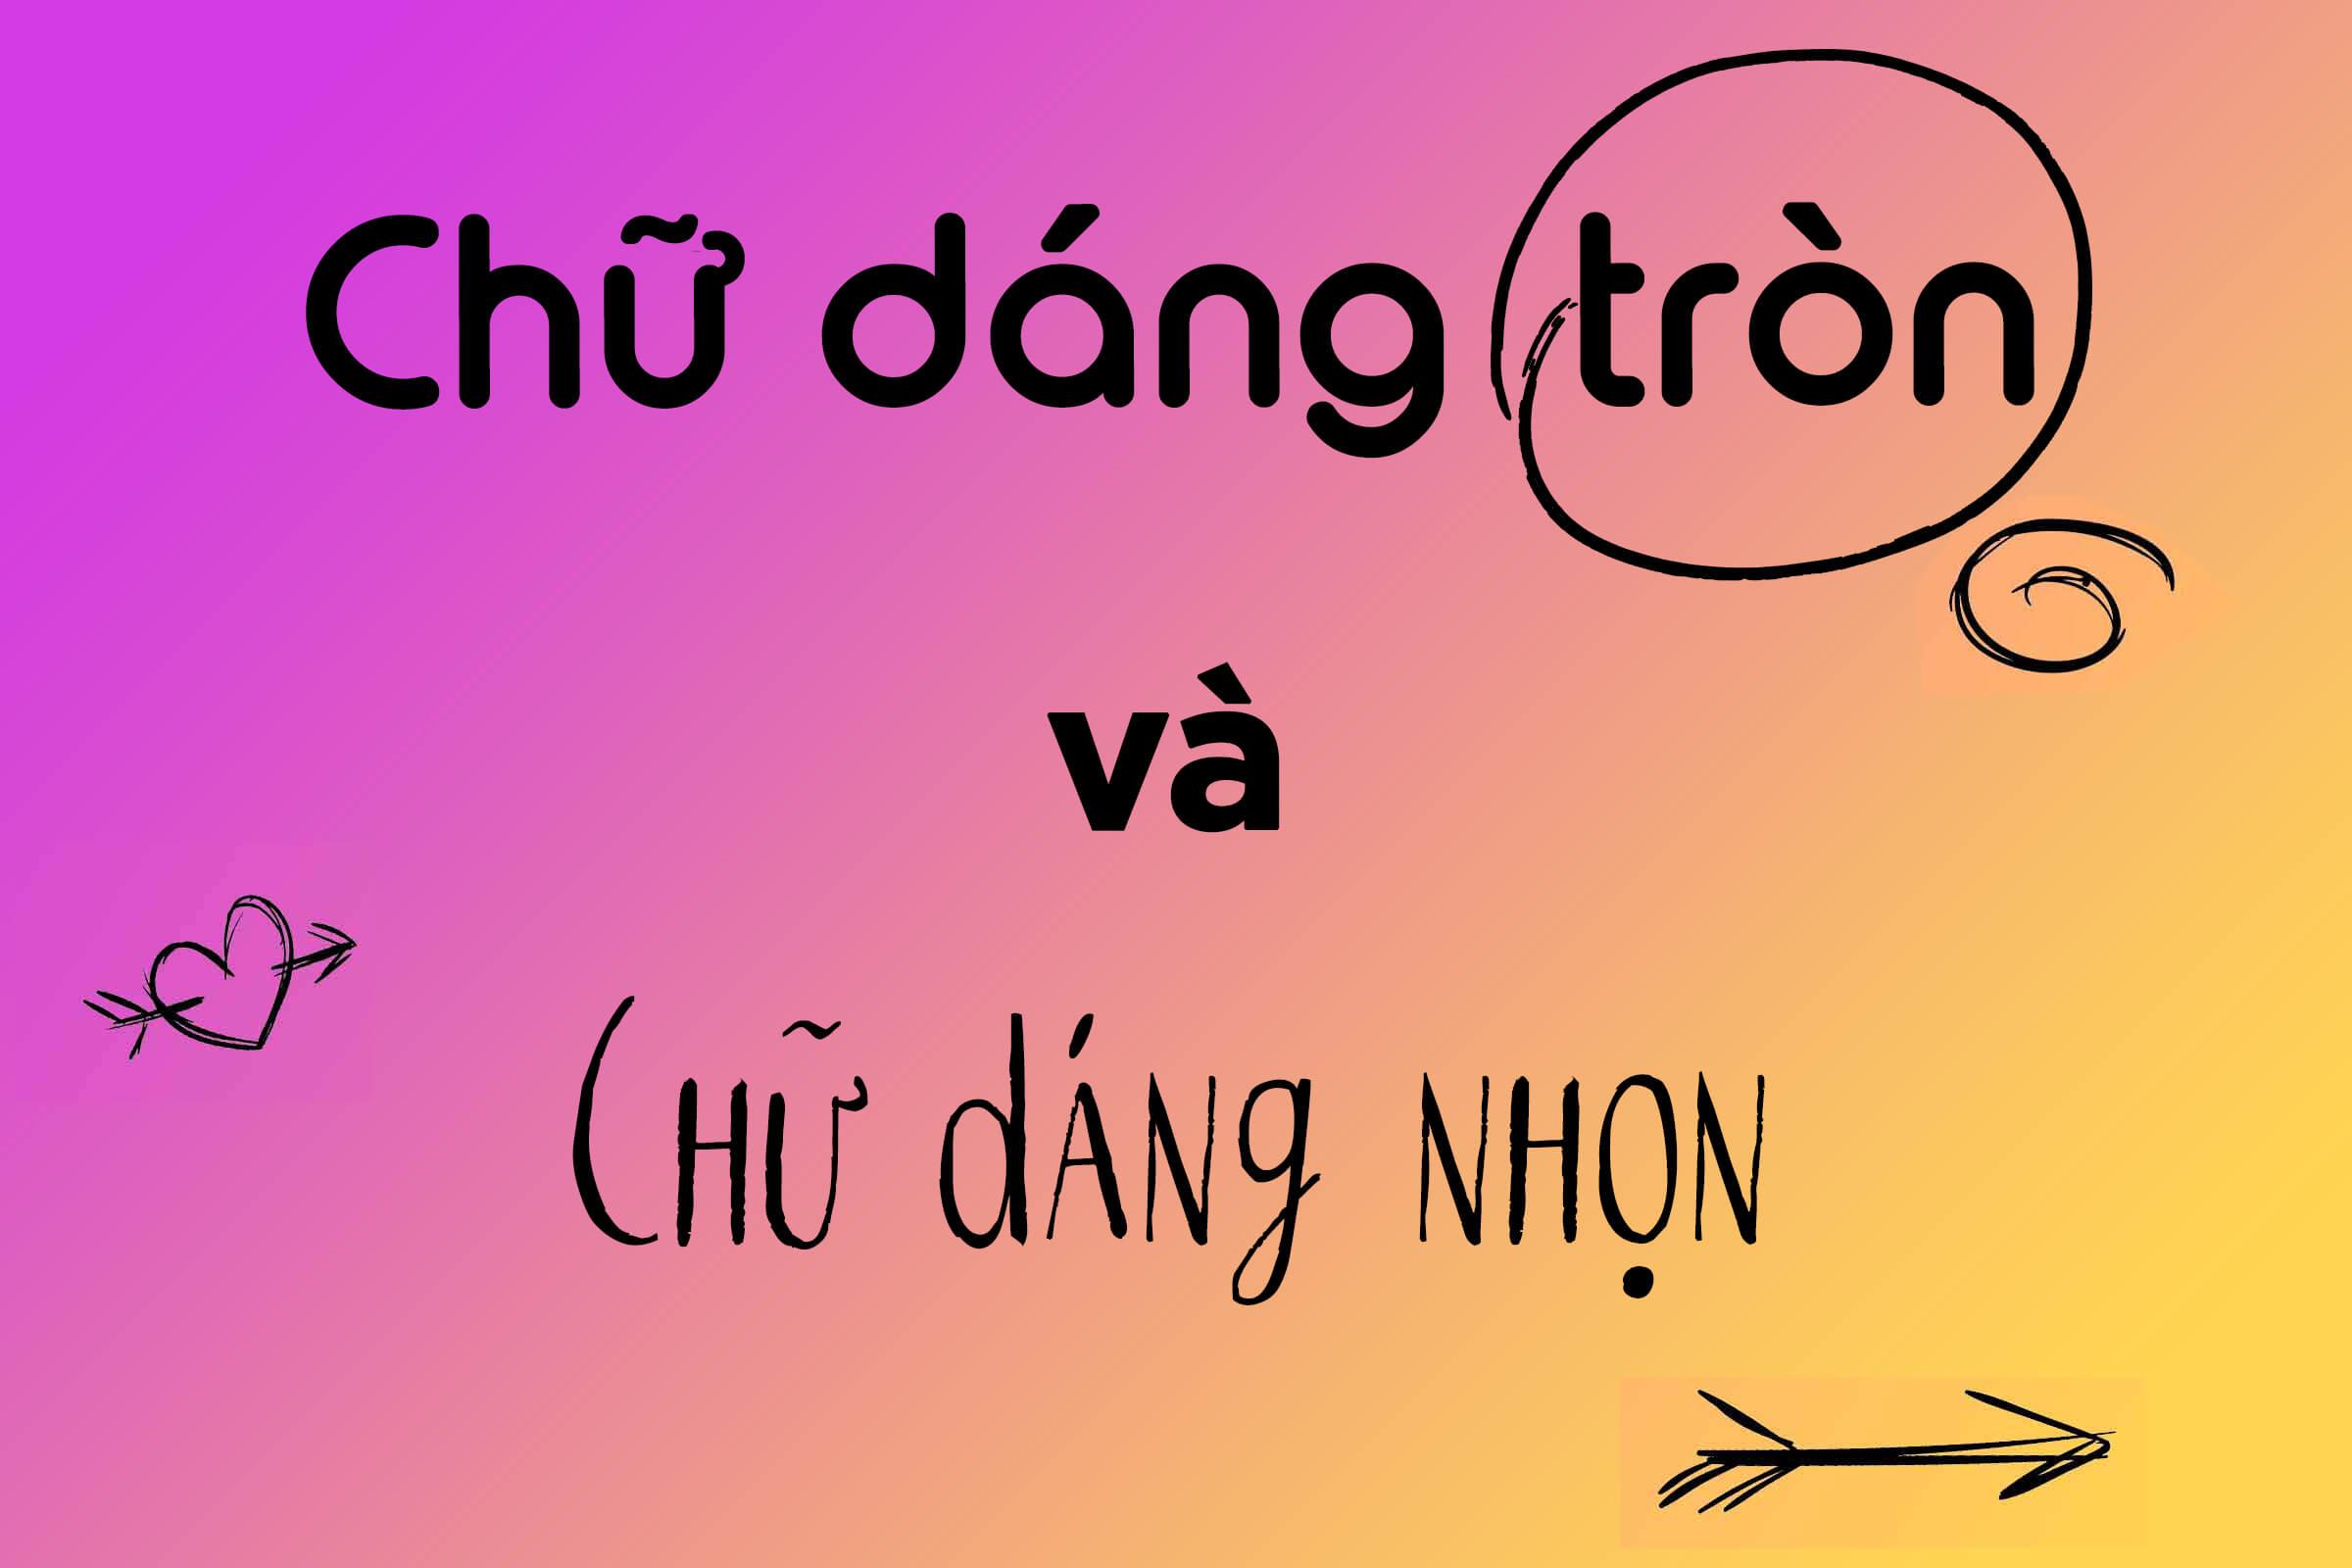 nhin-chu-doan-tinh-cach-huong-di-moi-giup-sep-doc-vi-nhan-vien-5